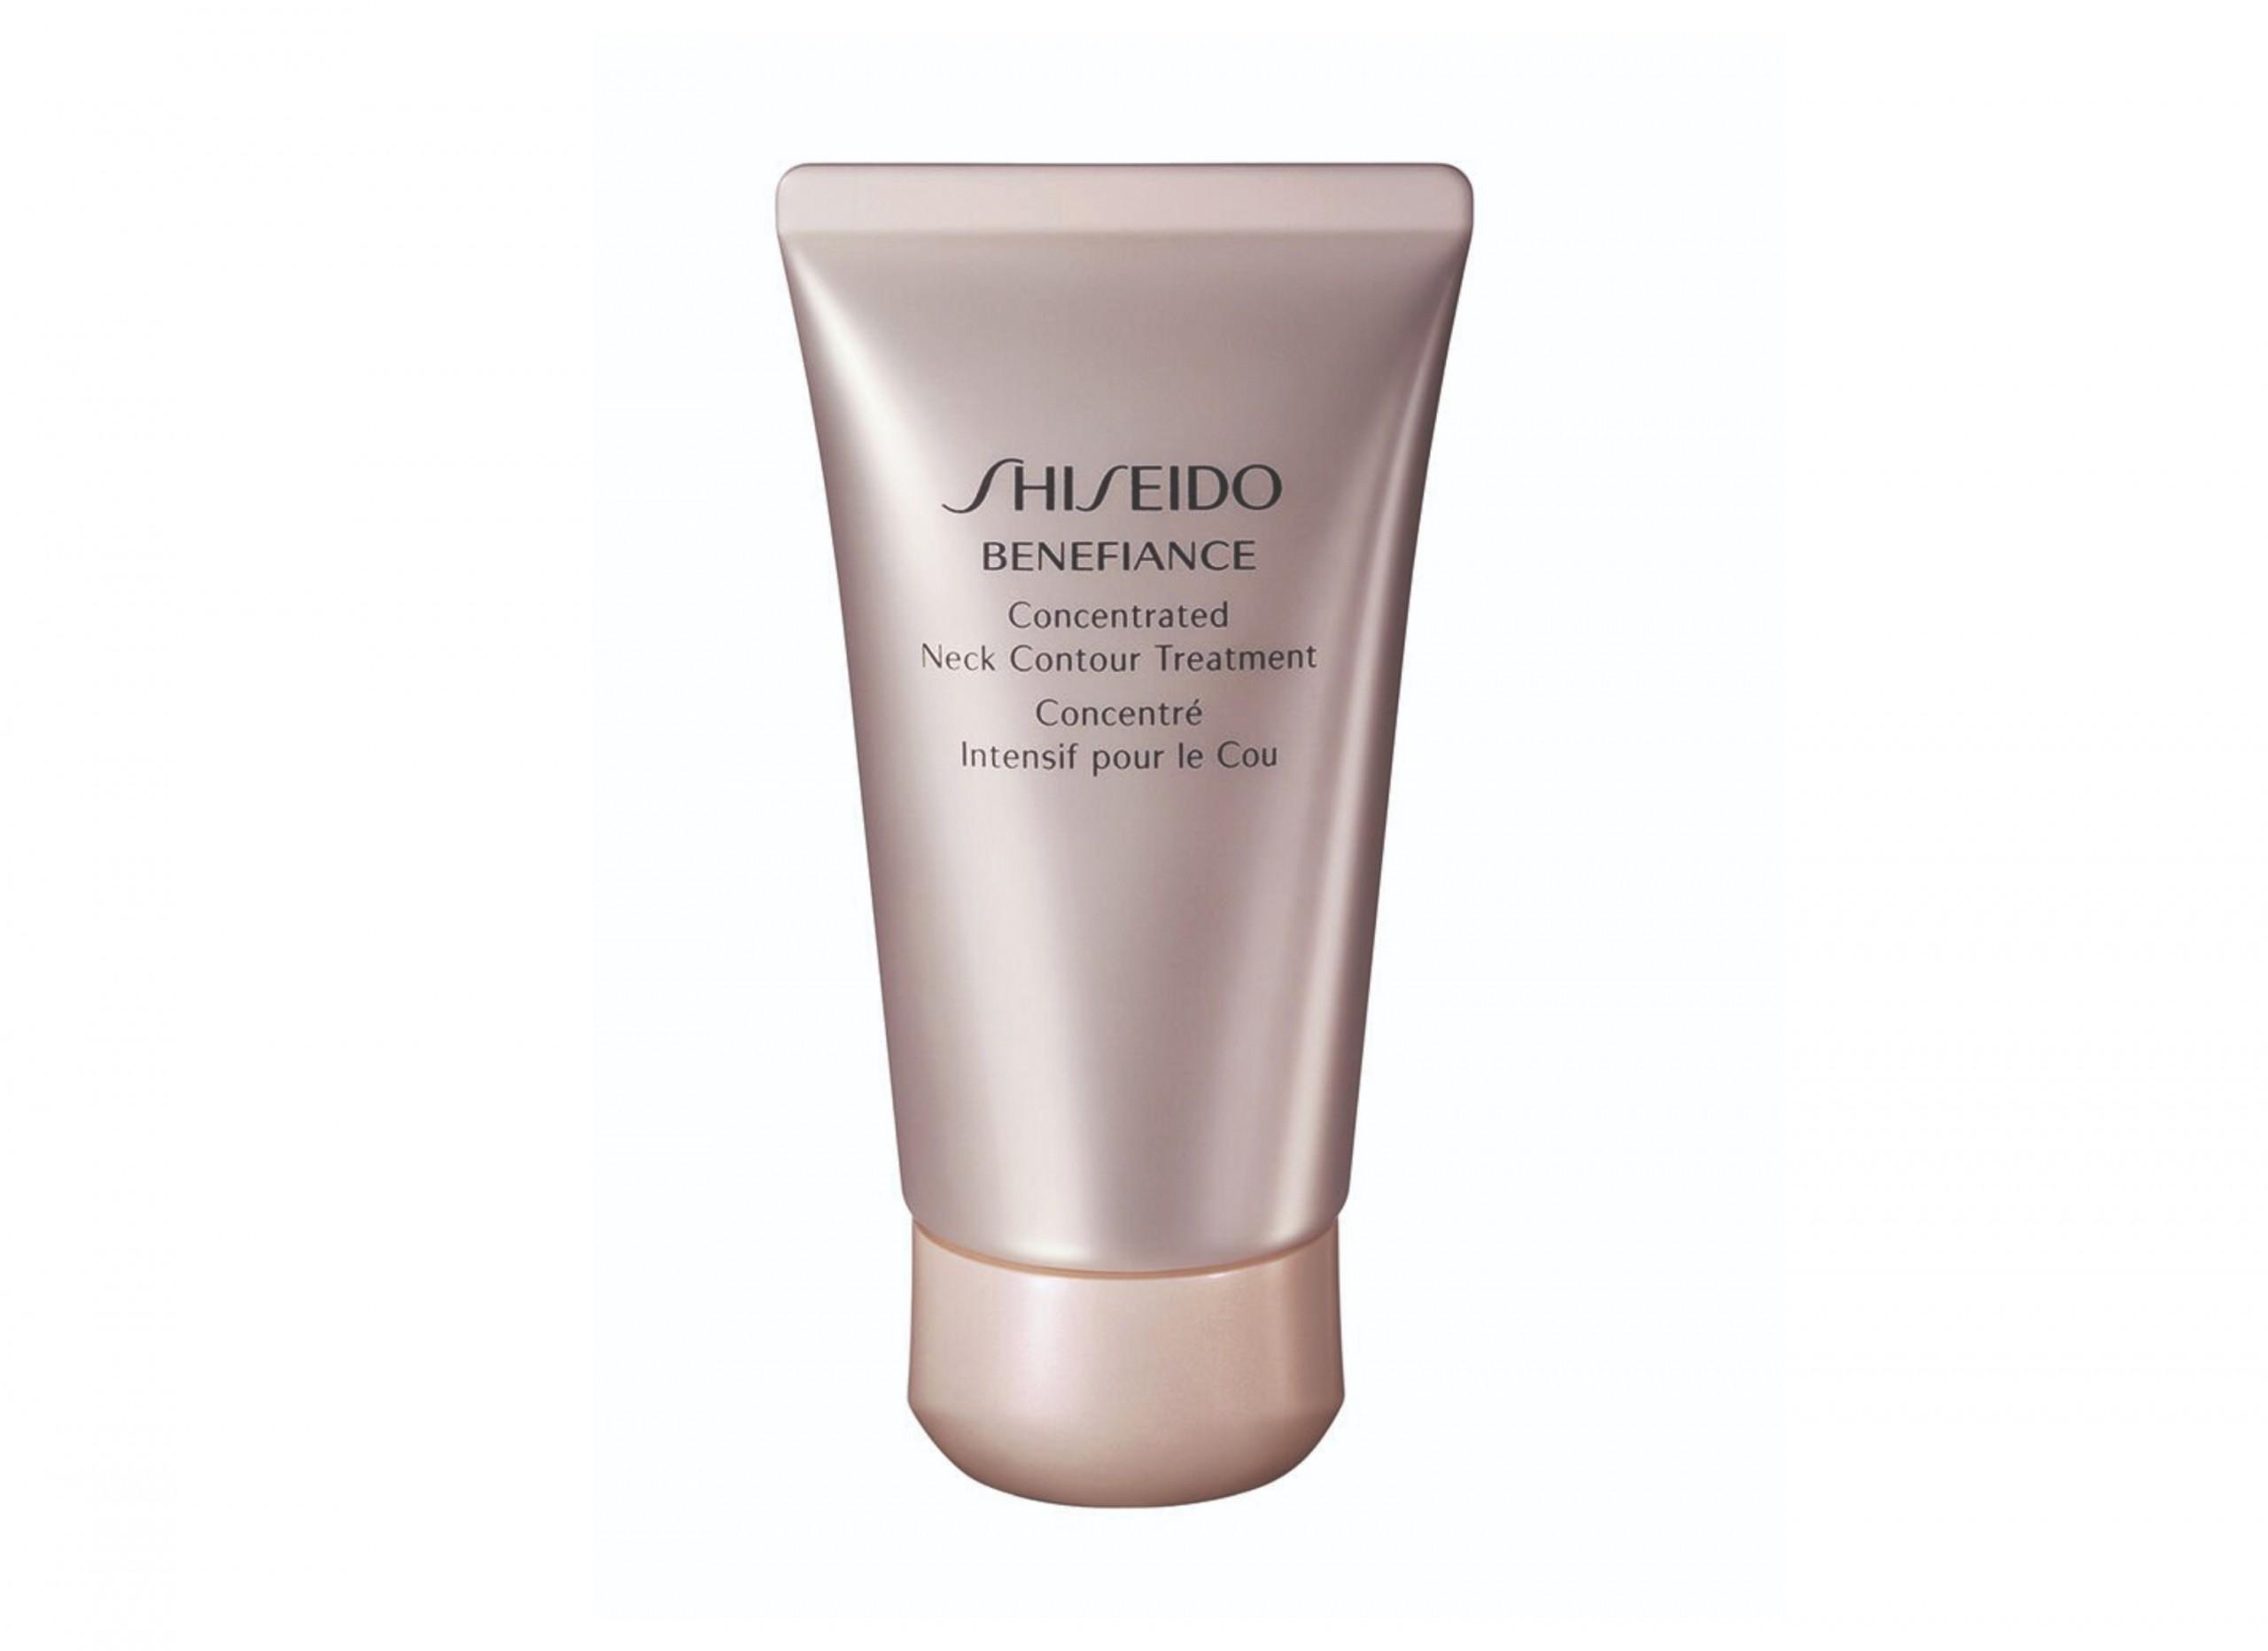 Shiseido Benefiance Concentrated Neck Contour Treatment, crema collo